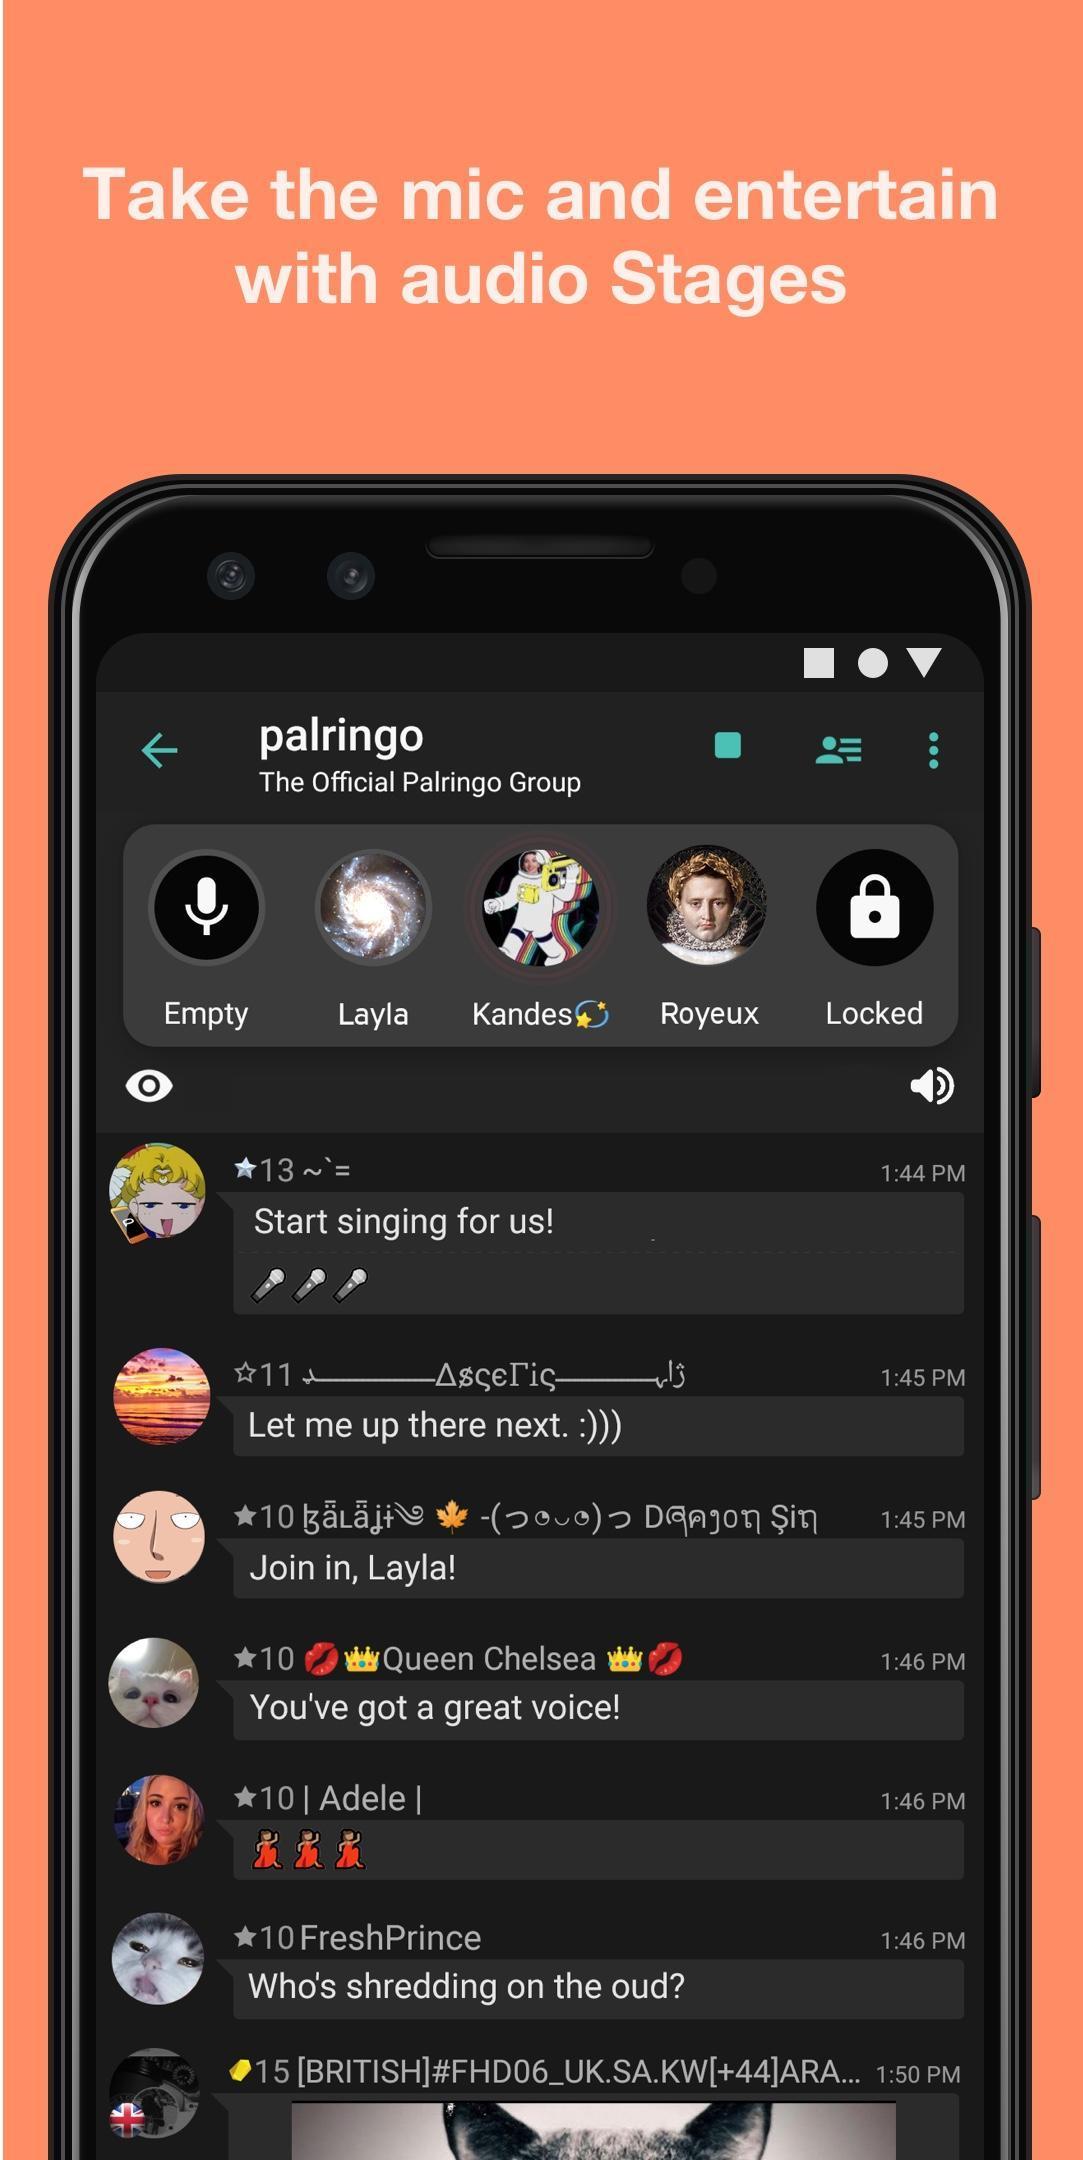 Palringo Group Messenger - chat, play games & more 9.2.1 Screenshot 2